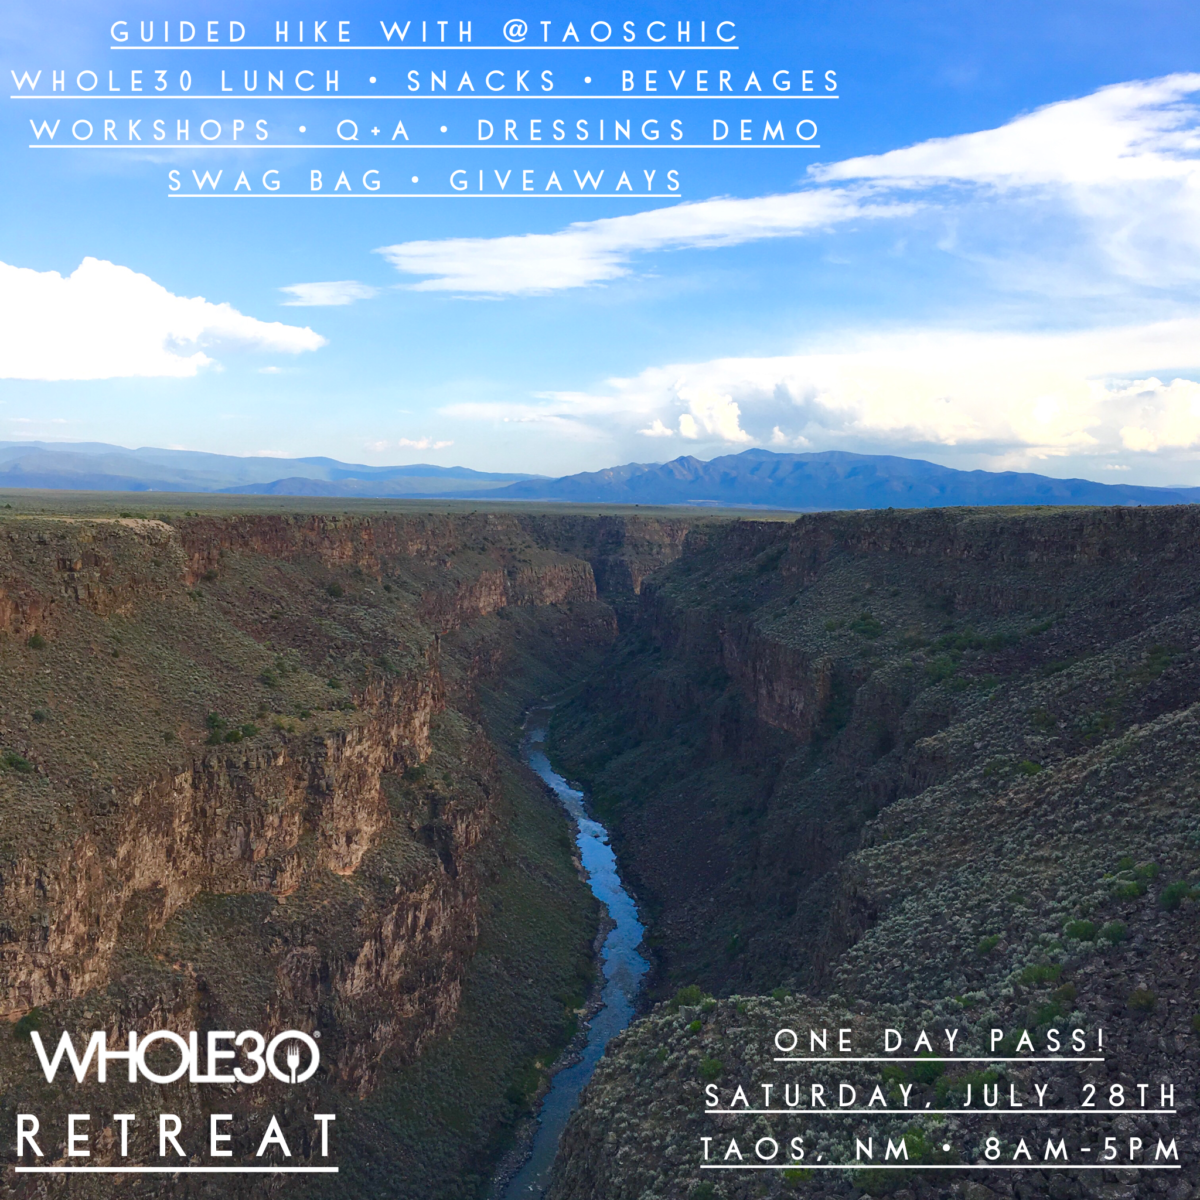 Taos Whole30 Retreat